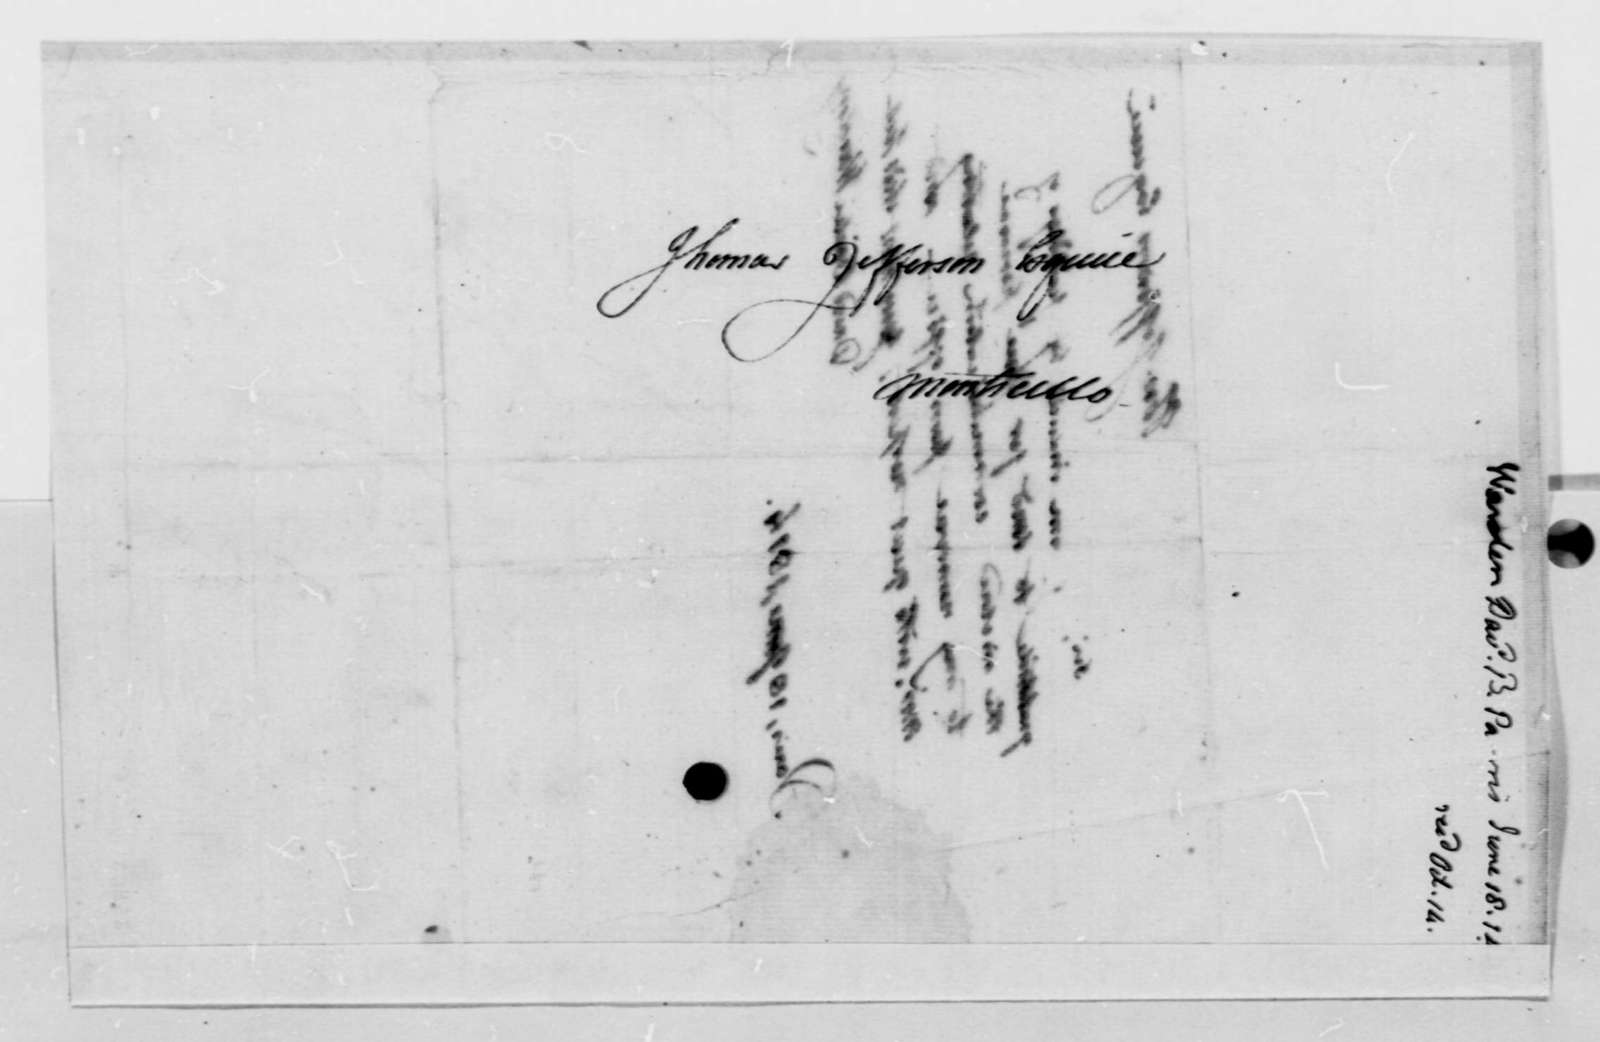 David B. Warden to Thomas Jefferson, June 18, 1814